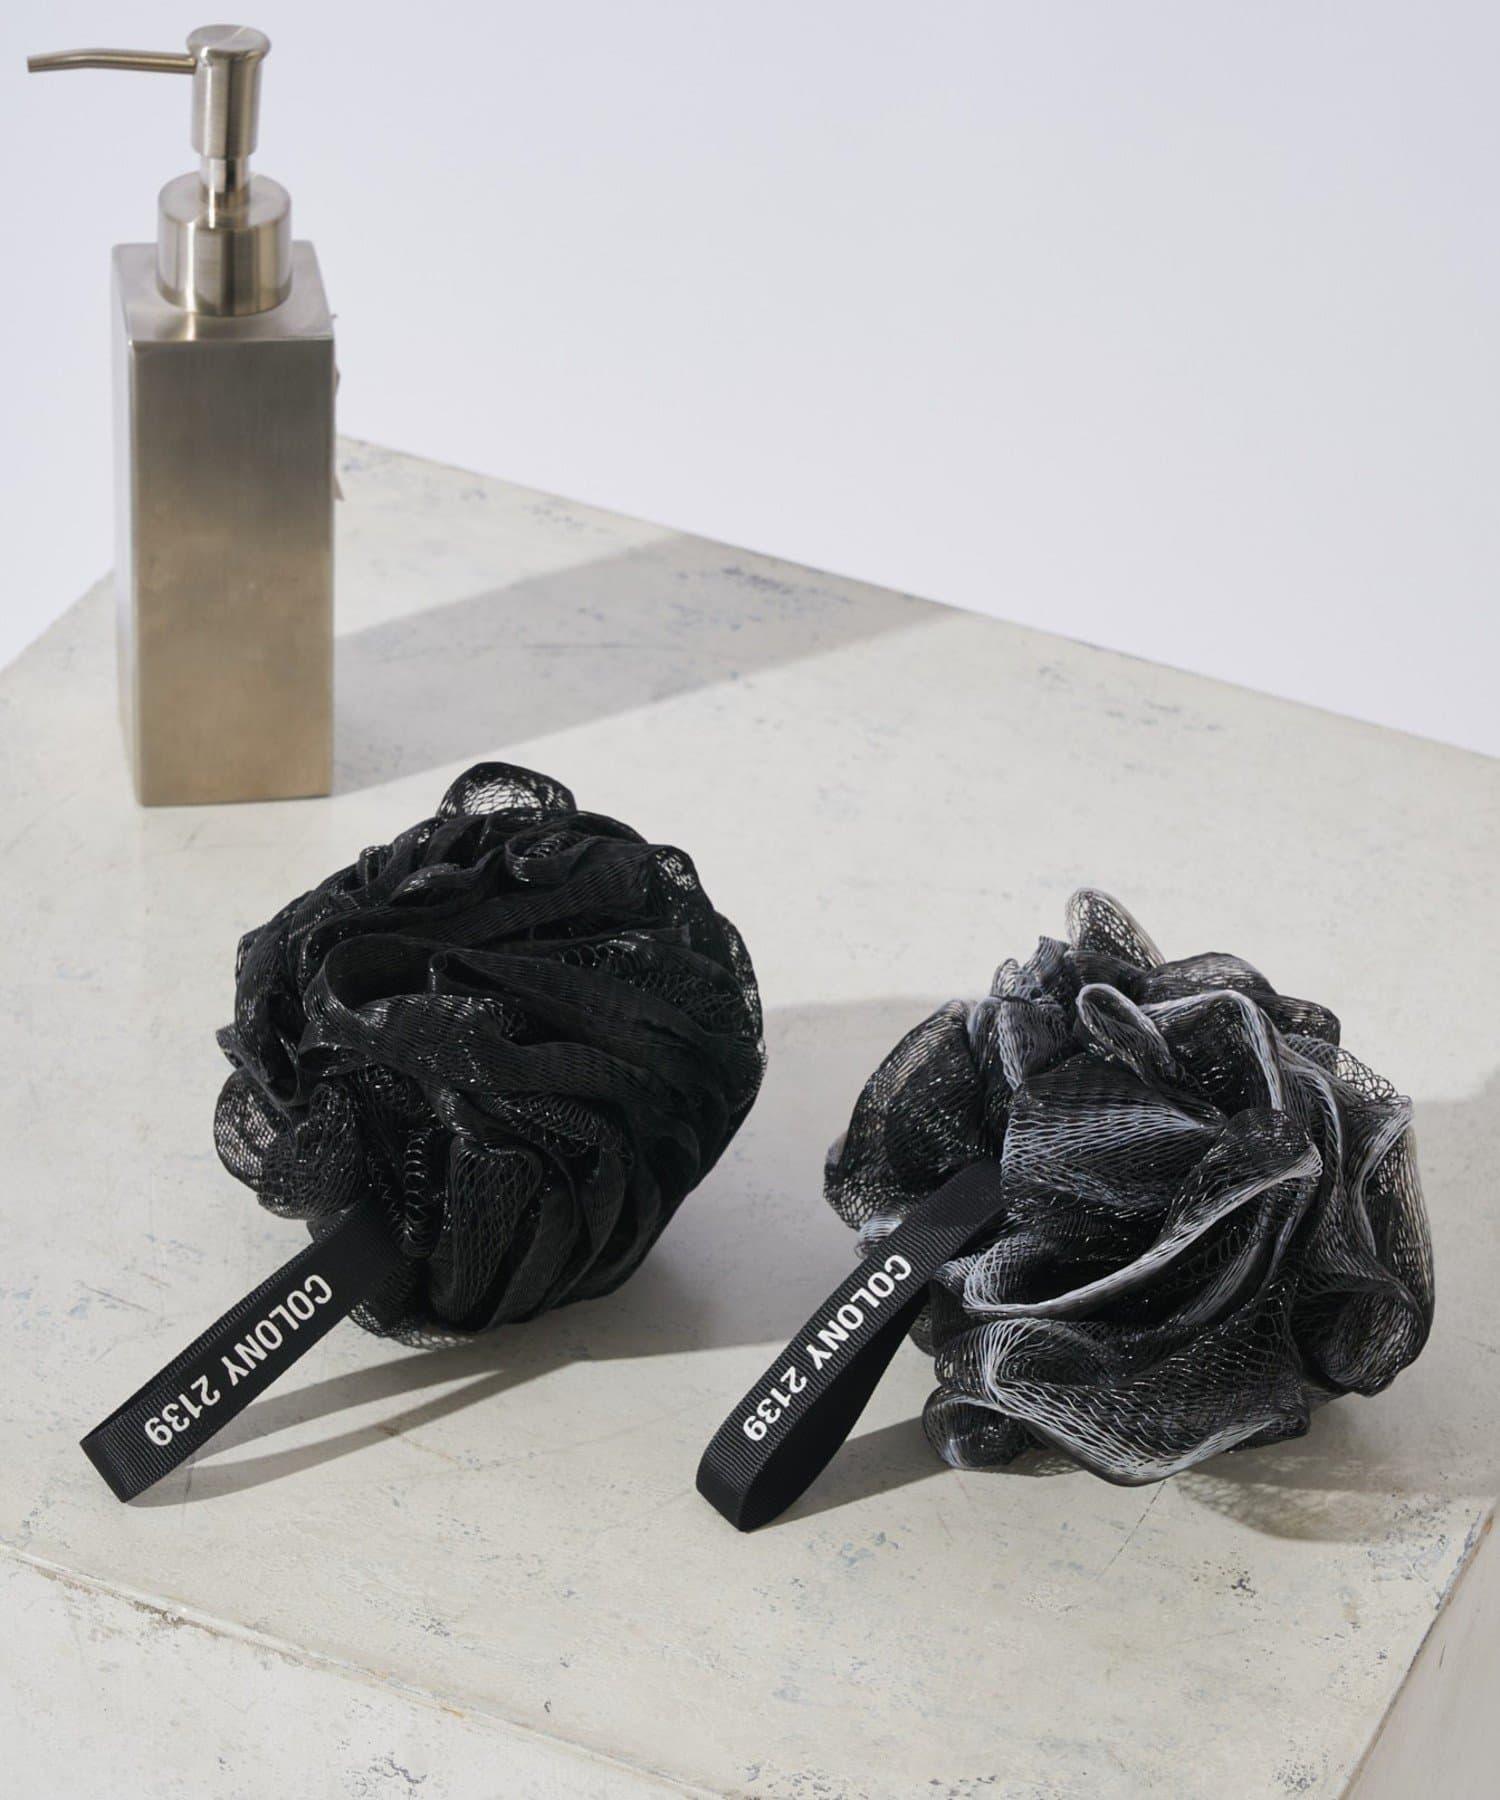 COLONY 2139(コロニー トゥーワンスリーナイン) ライフスタイル バスボールネット(2個セット)/泡立てネットボール ブラック